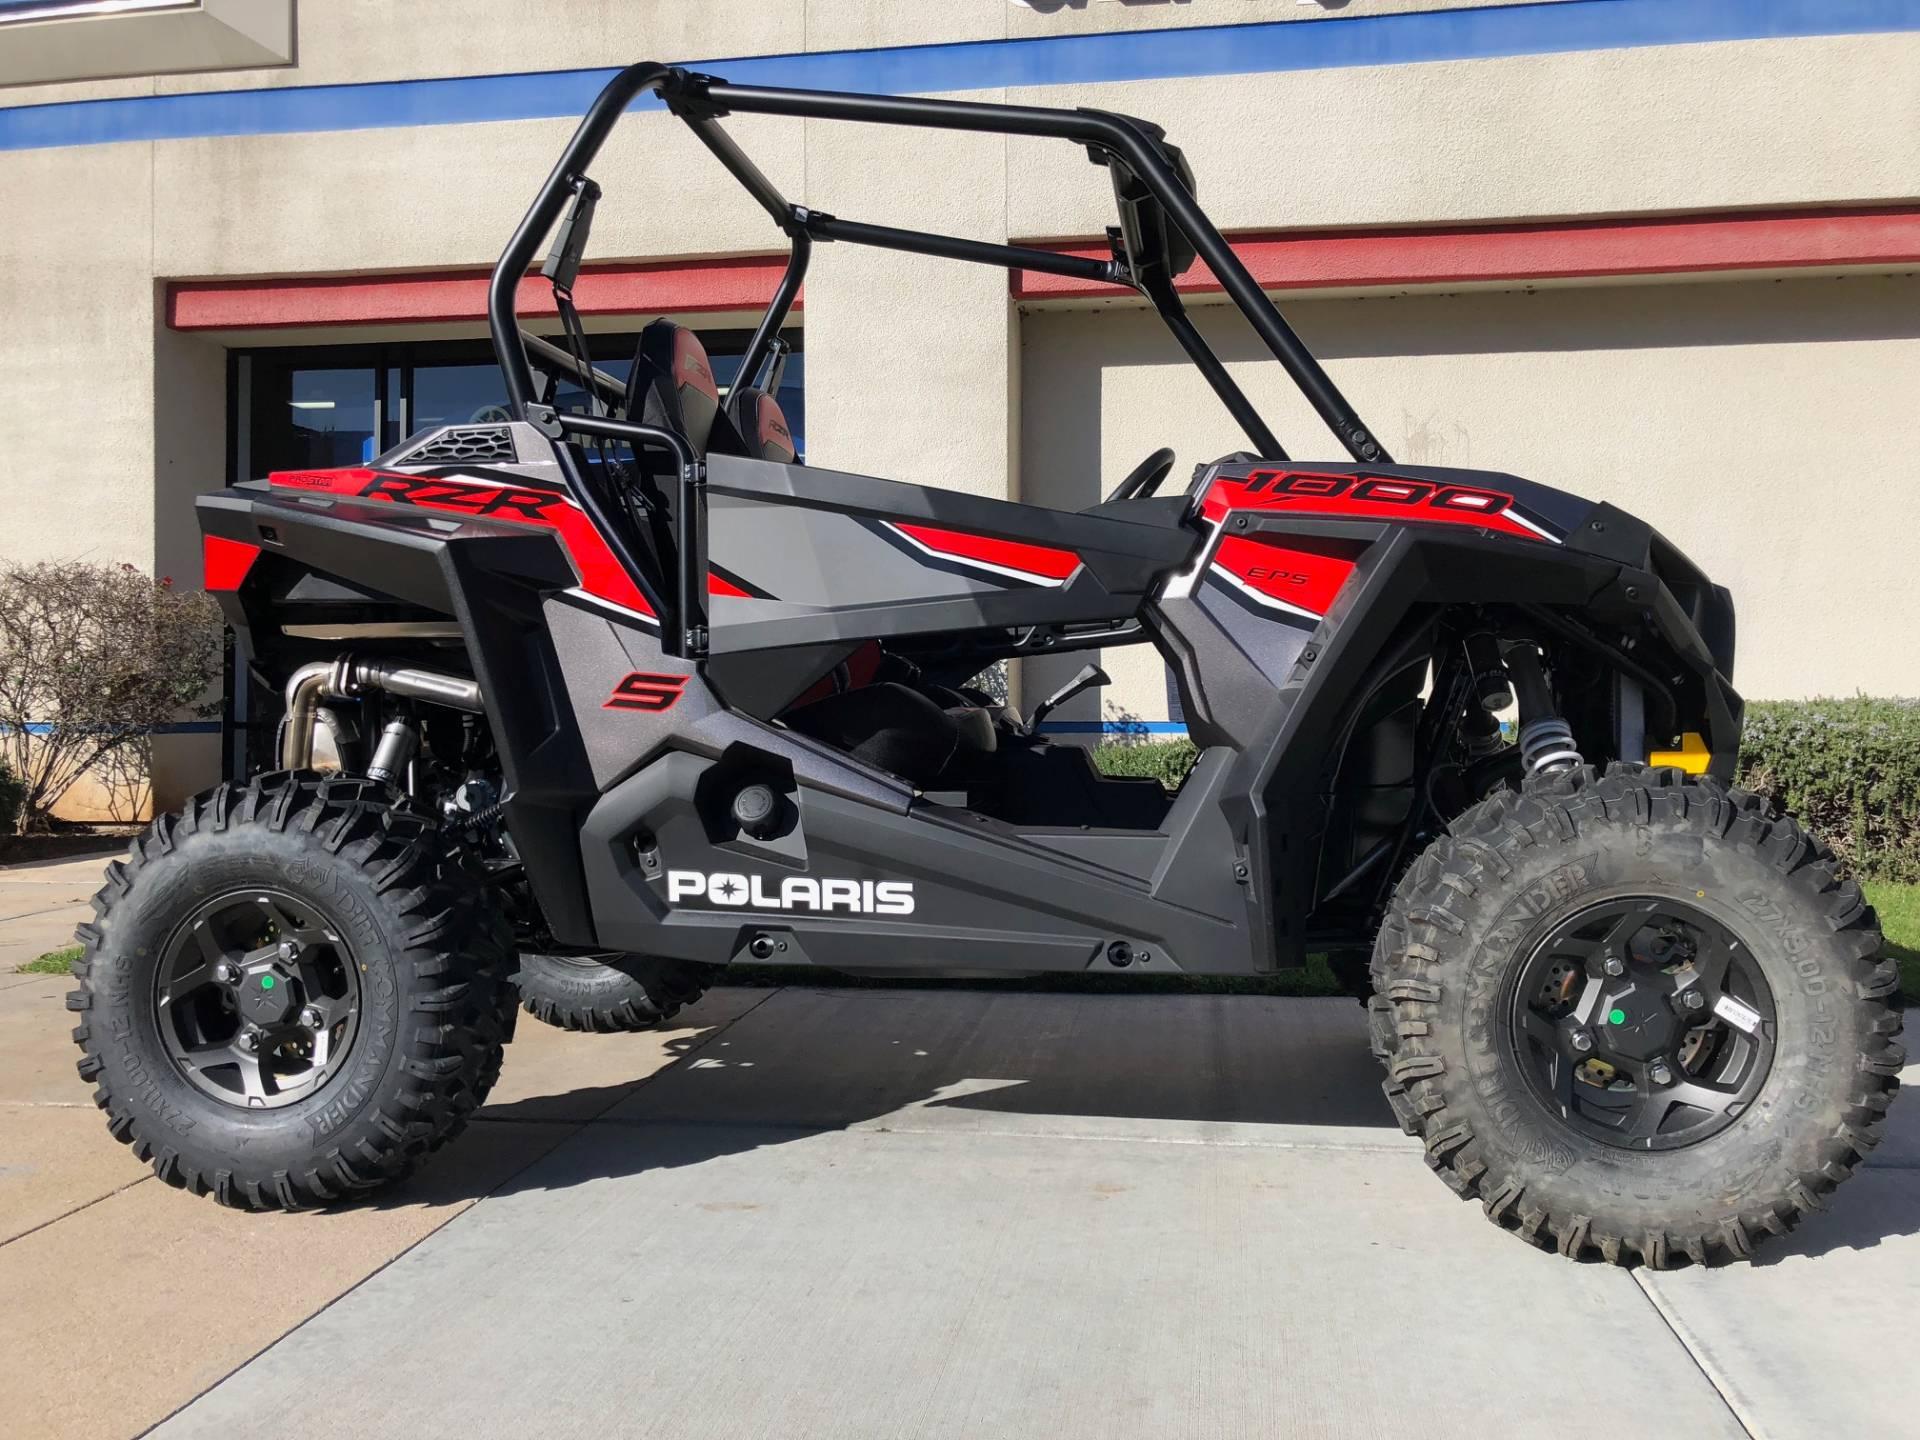 2019 Polaris RZR S 1000 EPS for sale 37659